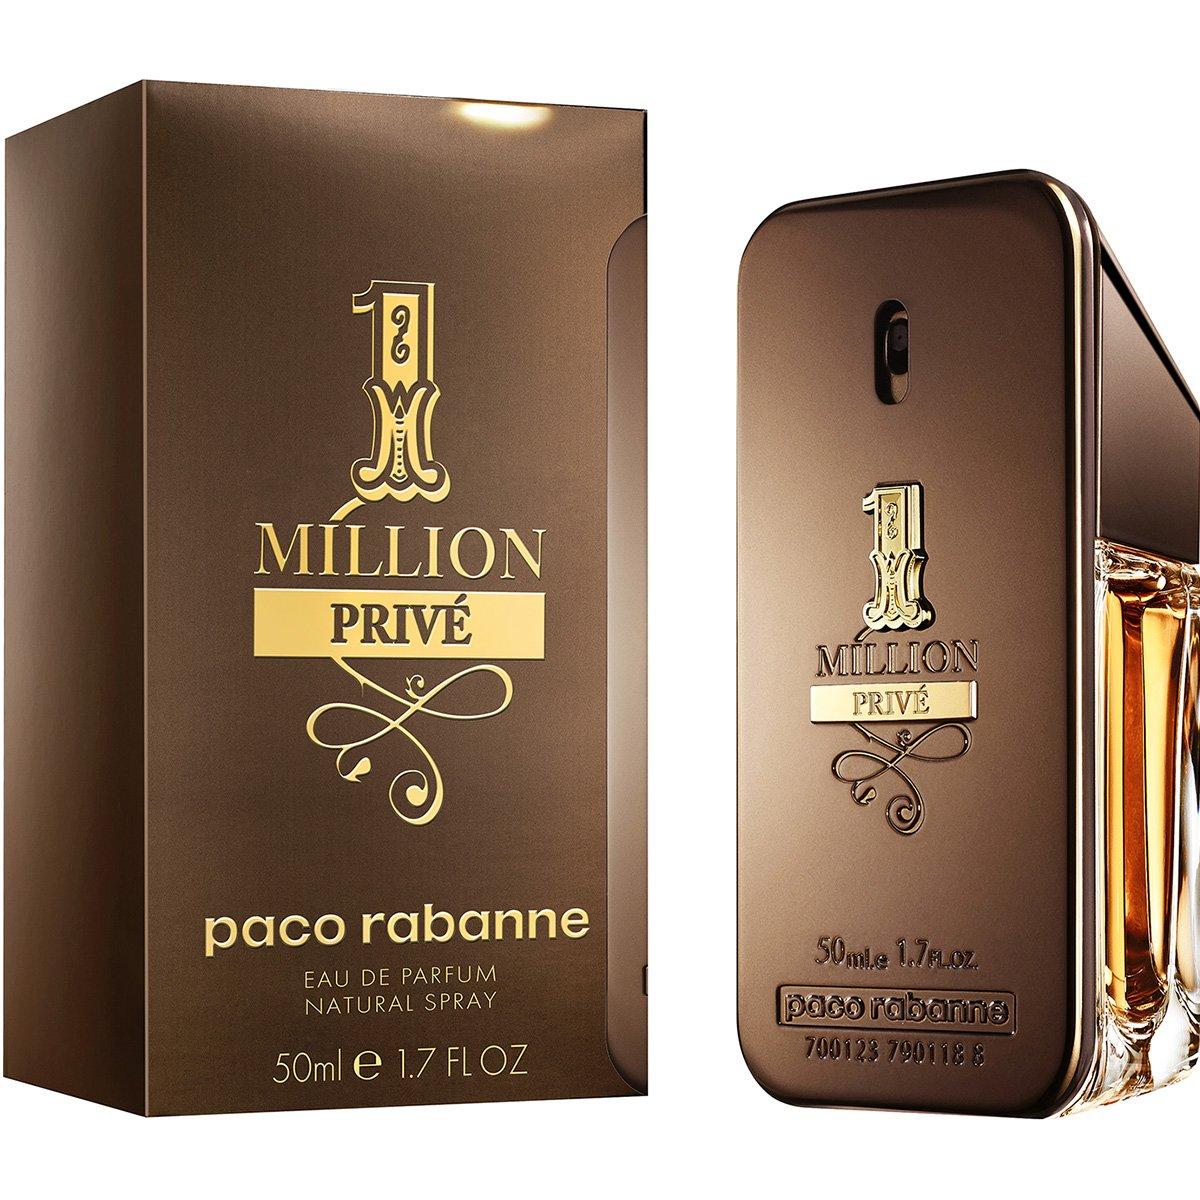 Perfume Masculino 1 Million Privé Paco Rabanne Eau de Parfum 50ml